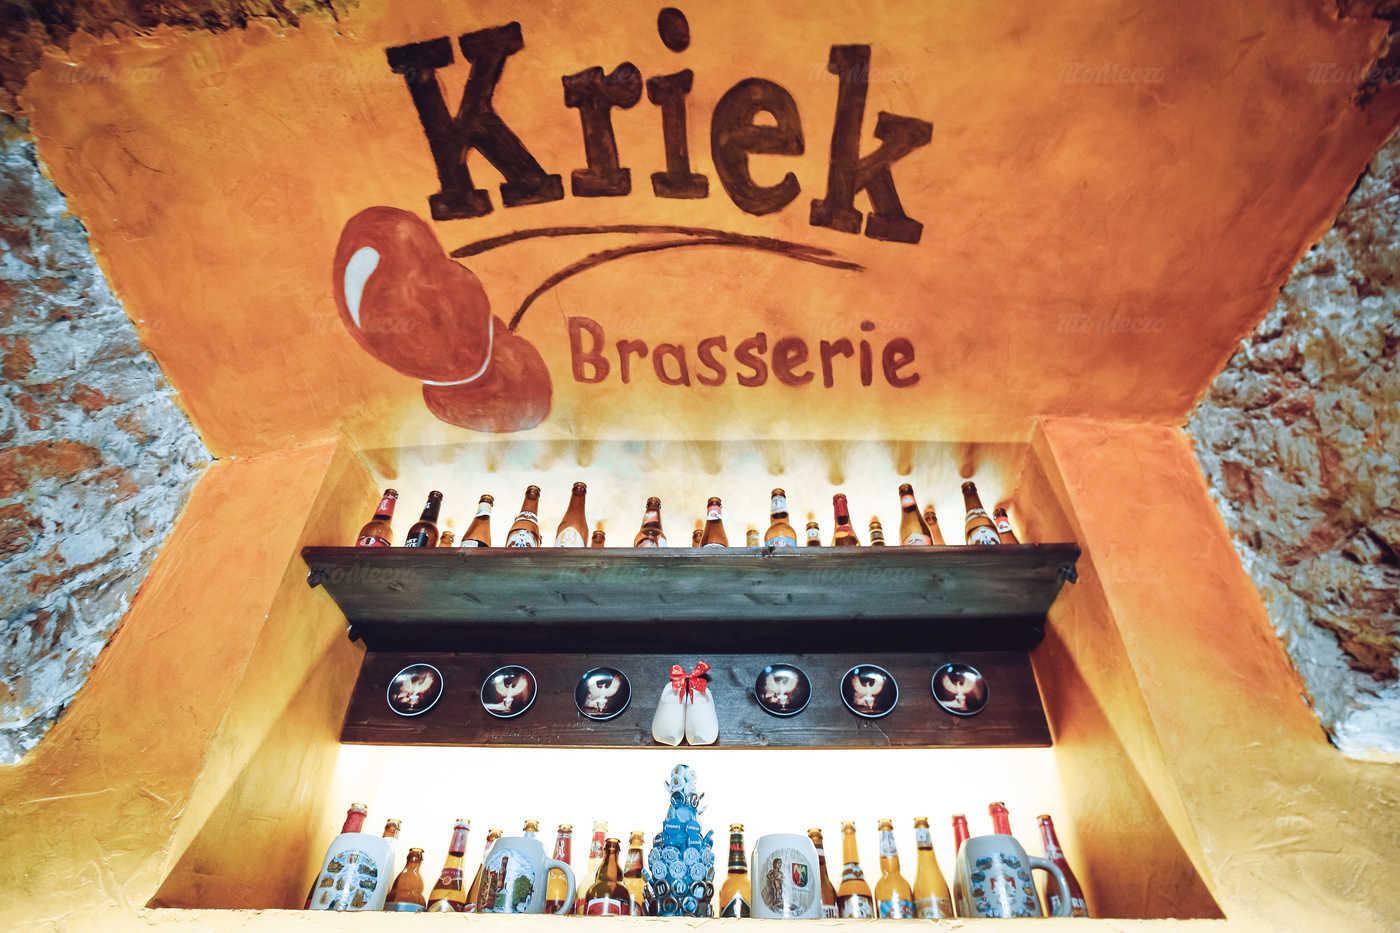 Ресторан Брассерия Крик (Brasserie Kriek) на Невском проспекте фото 8